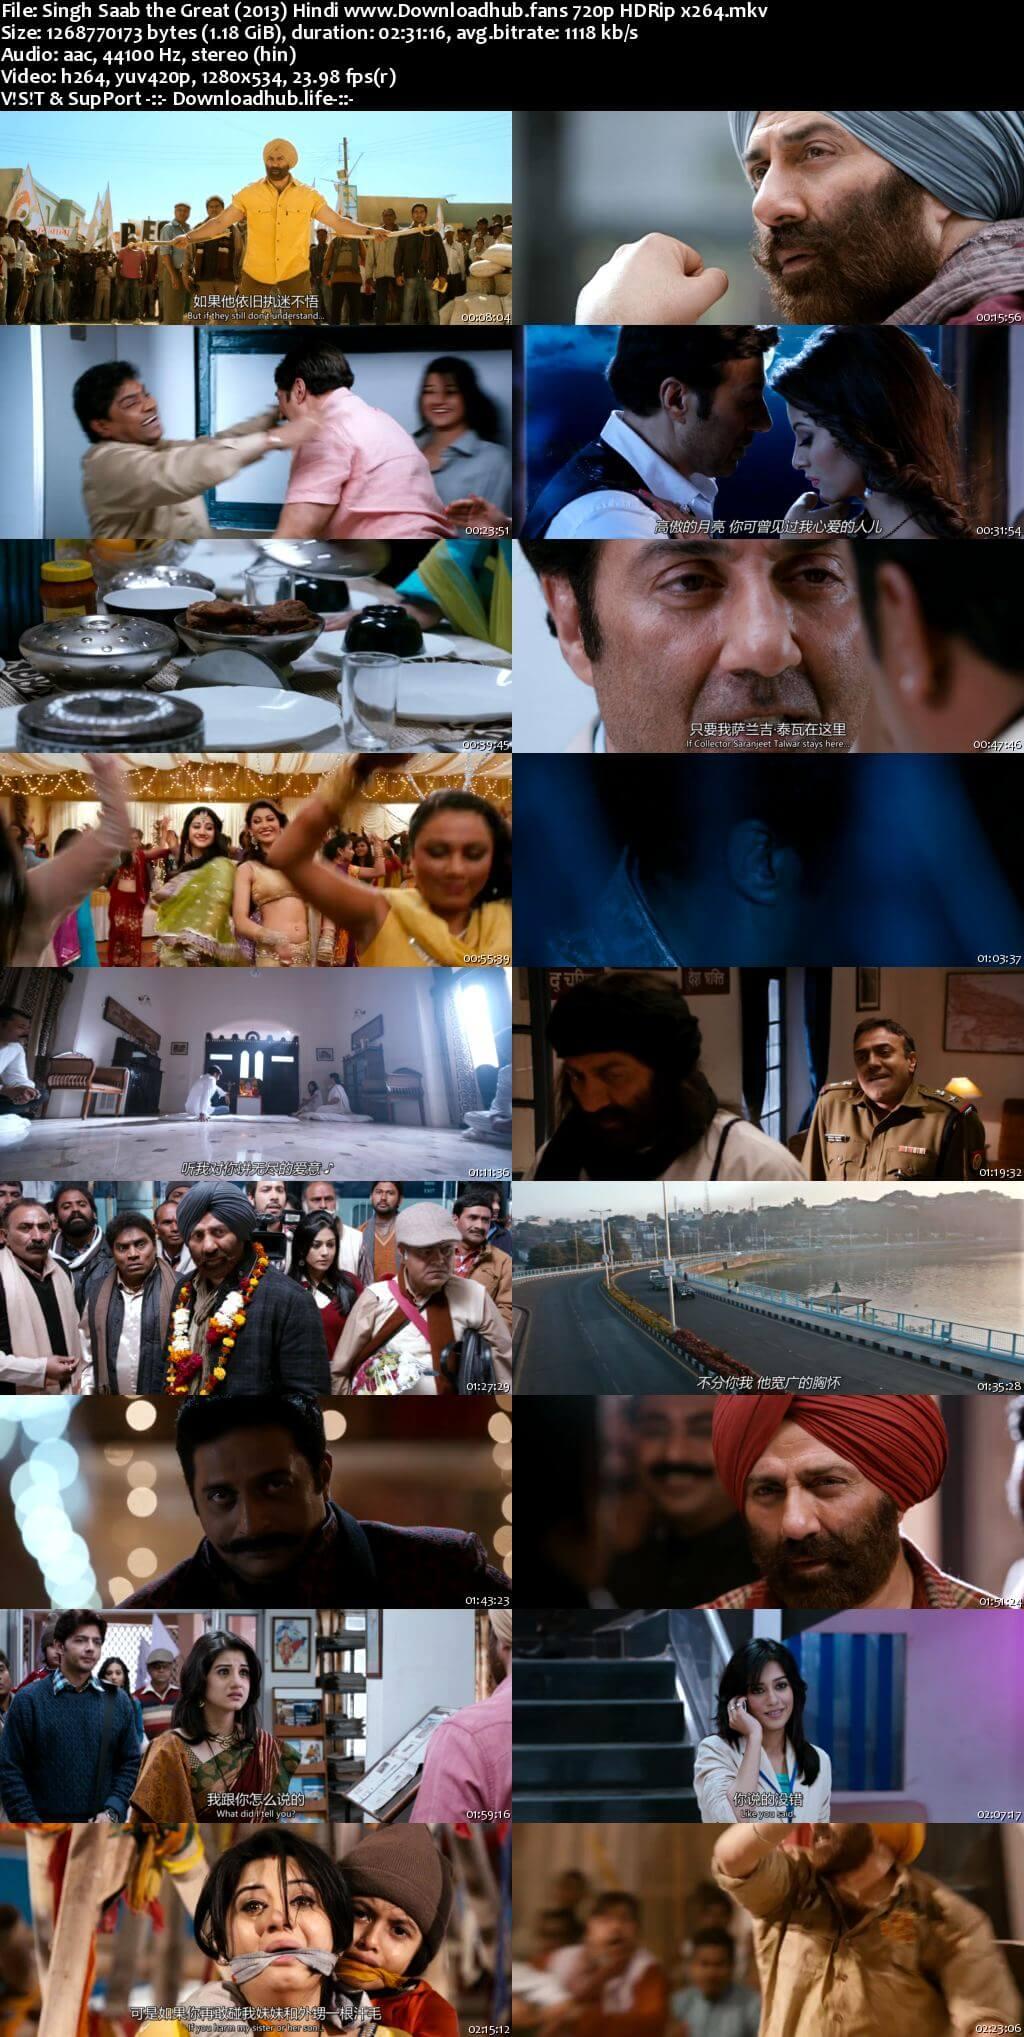 Singh Saab the Great 2013 Hindi 720p HDRip x264